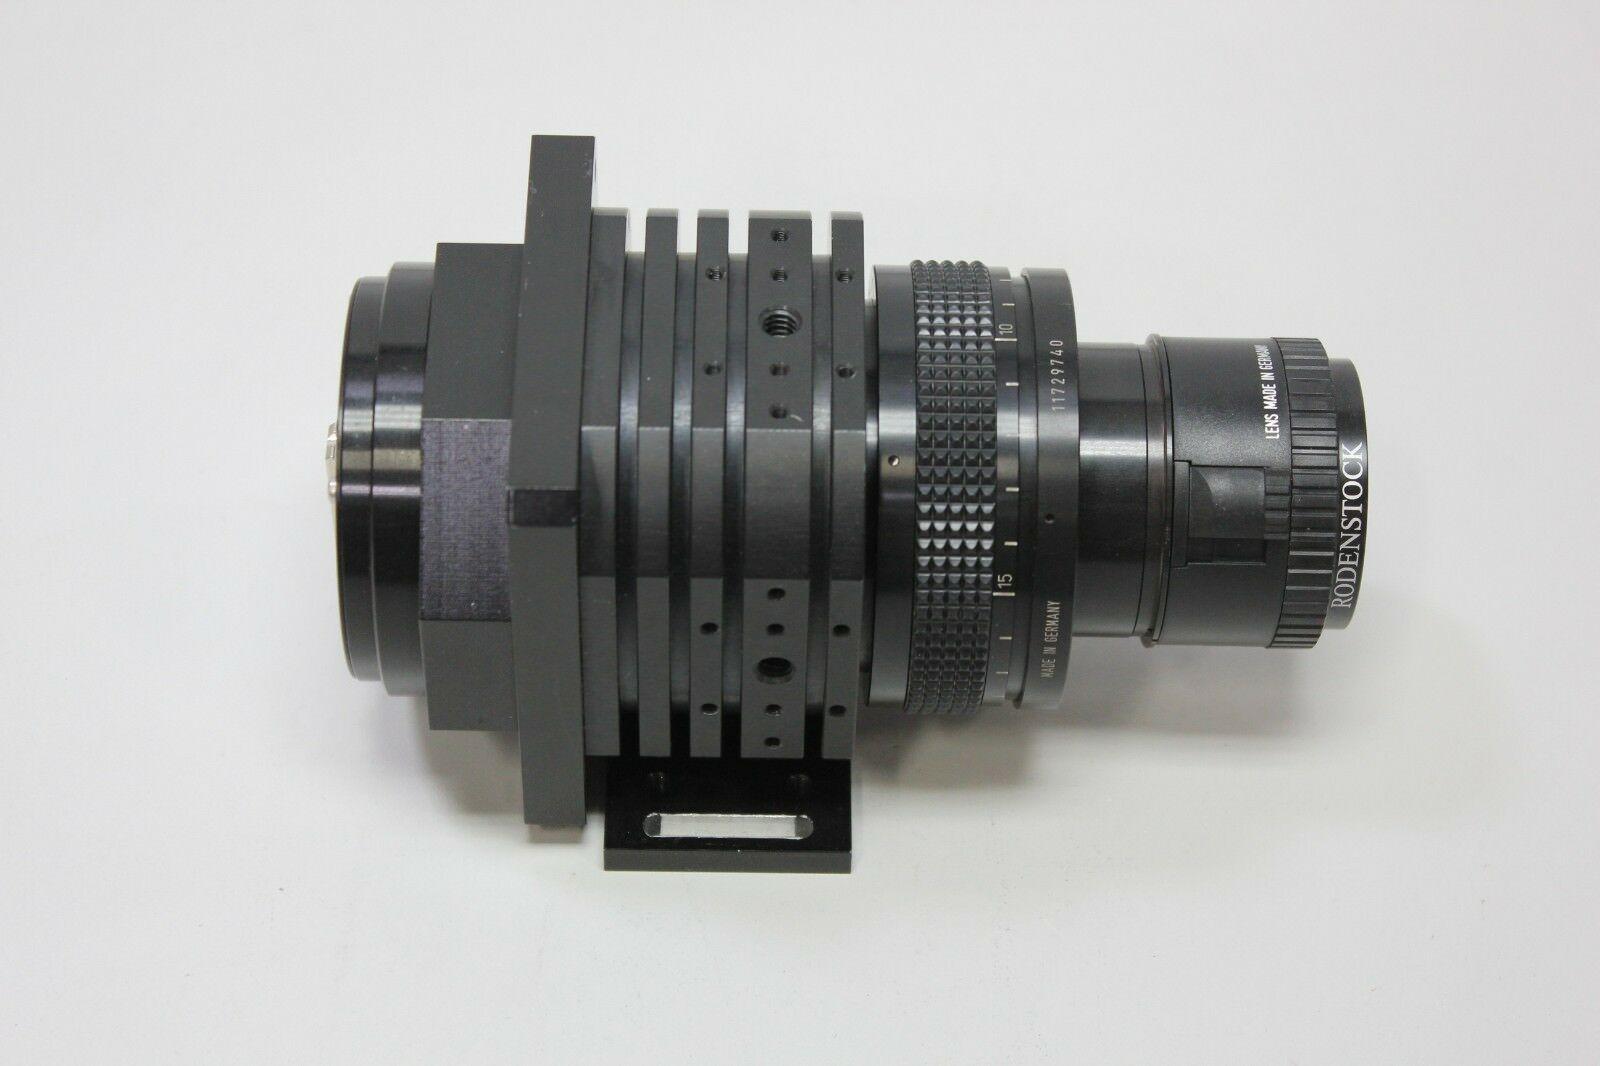 Lot 9E - Schafter & Kirchhoff Digital Line Scan Camera With Rodenstock Lens